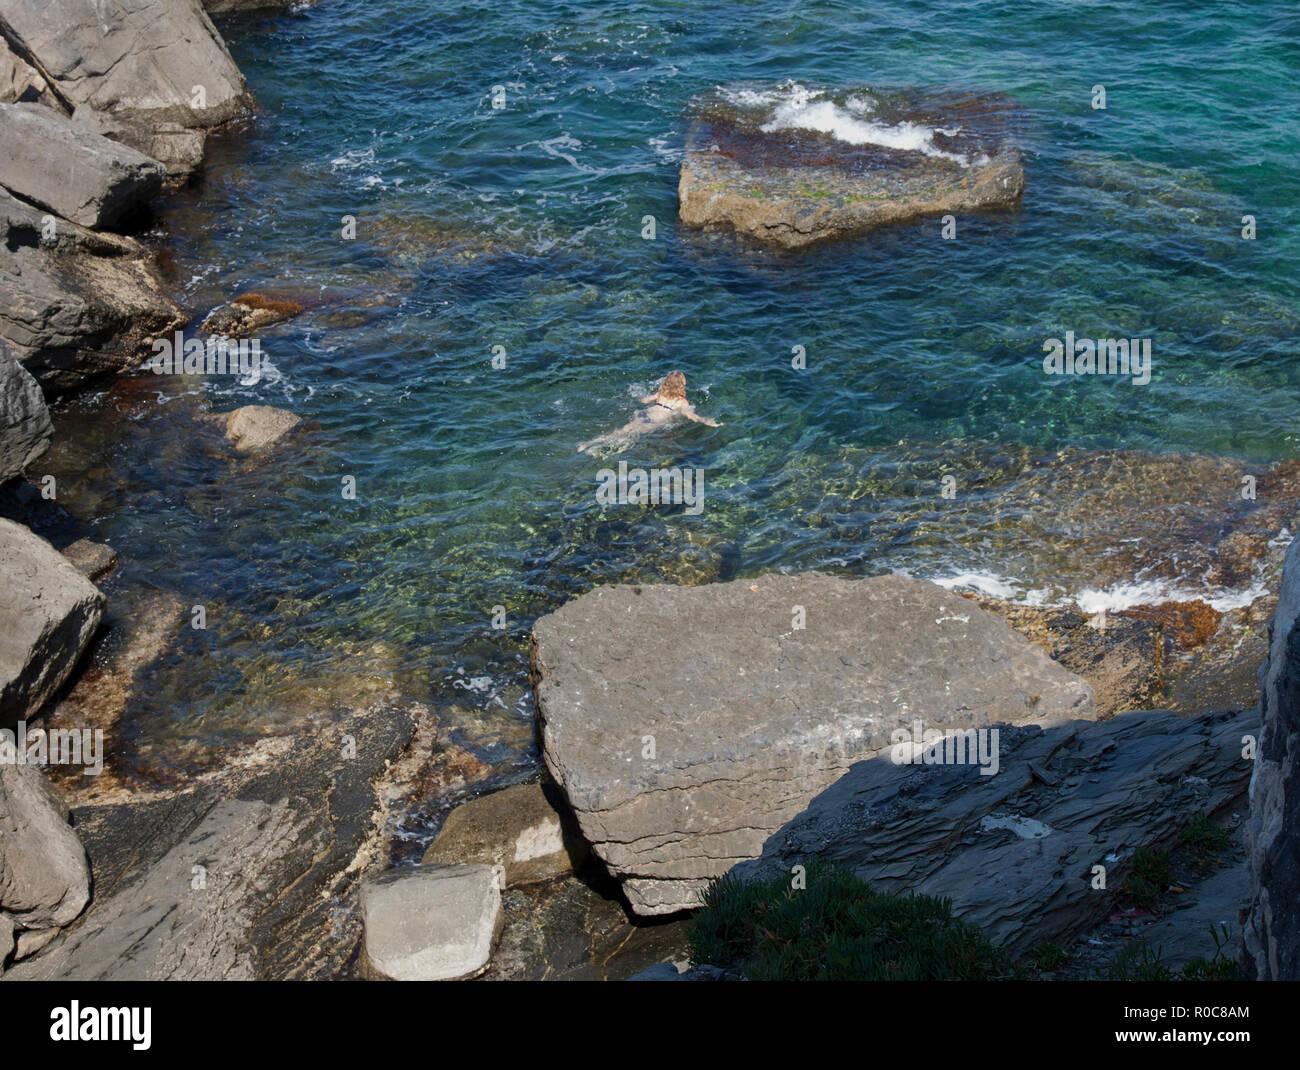 Young Girl Swimming, Bay of Poets, Rocky Coast, Portovenere, La Spezia, Italy. - Stock Image